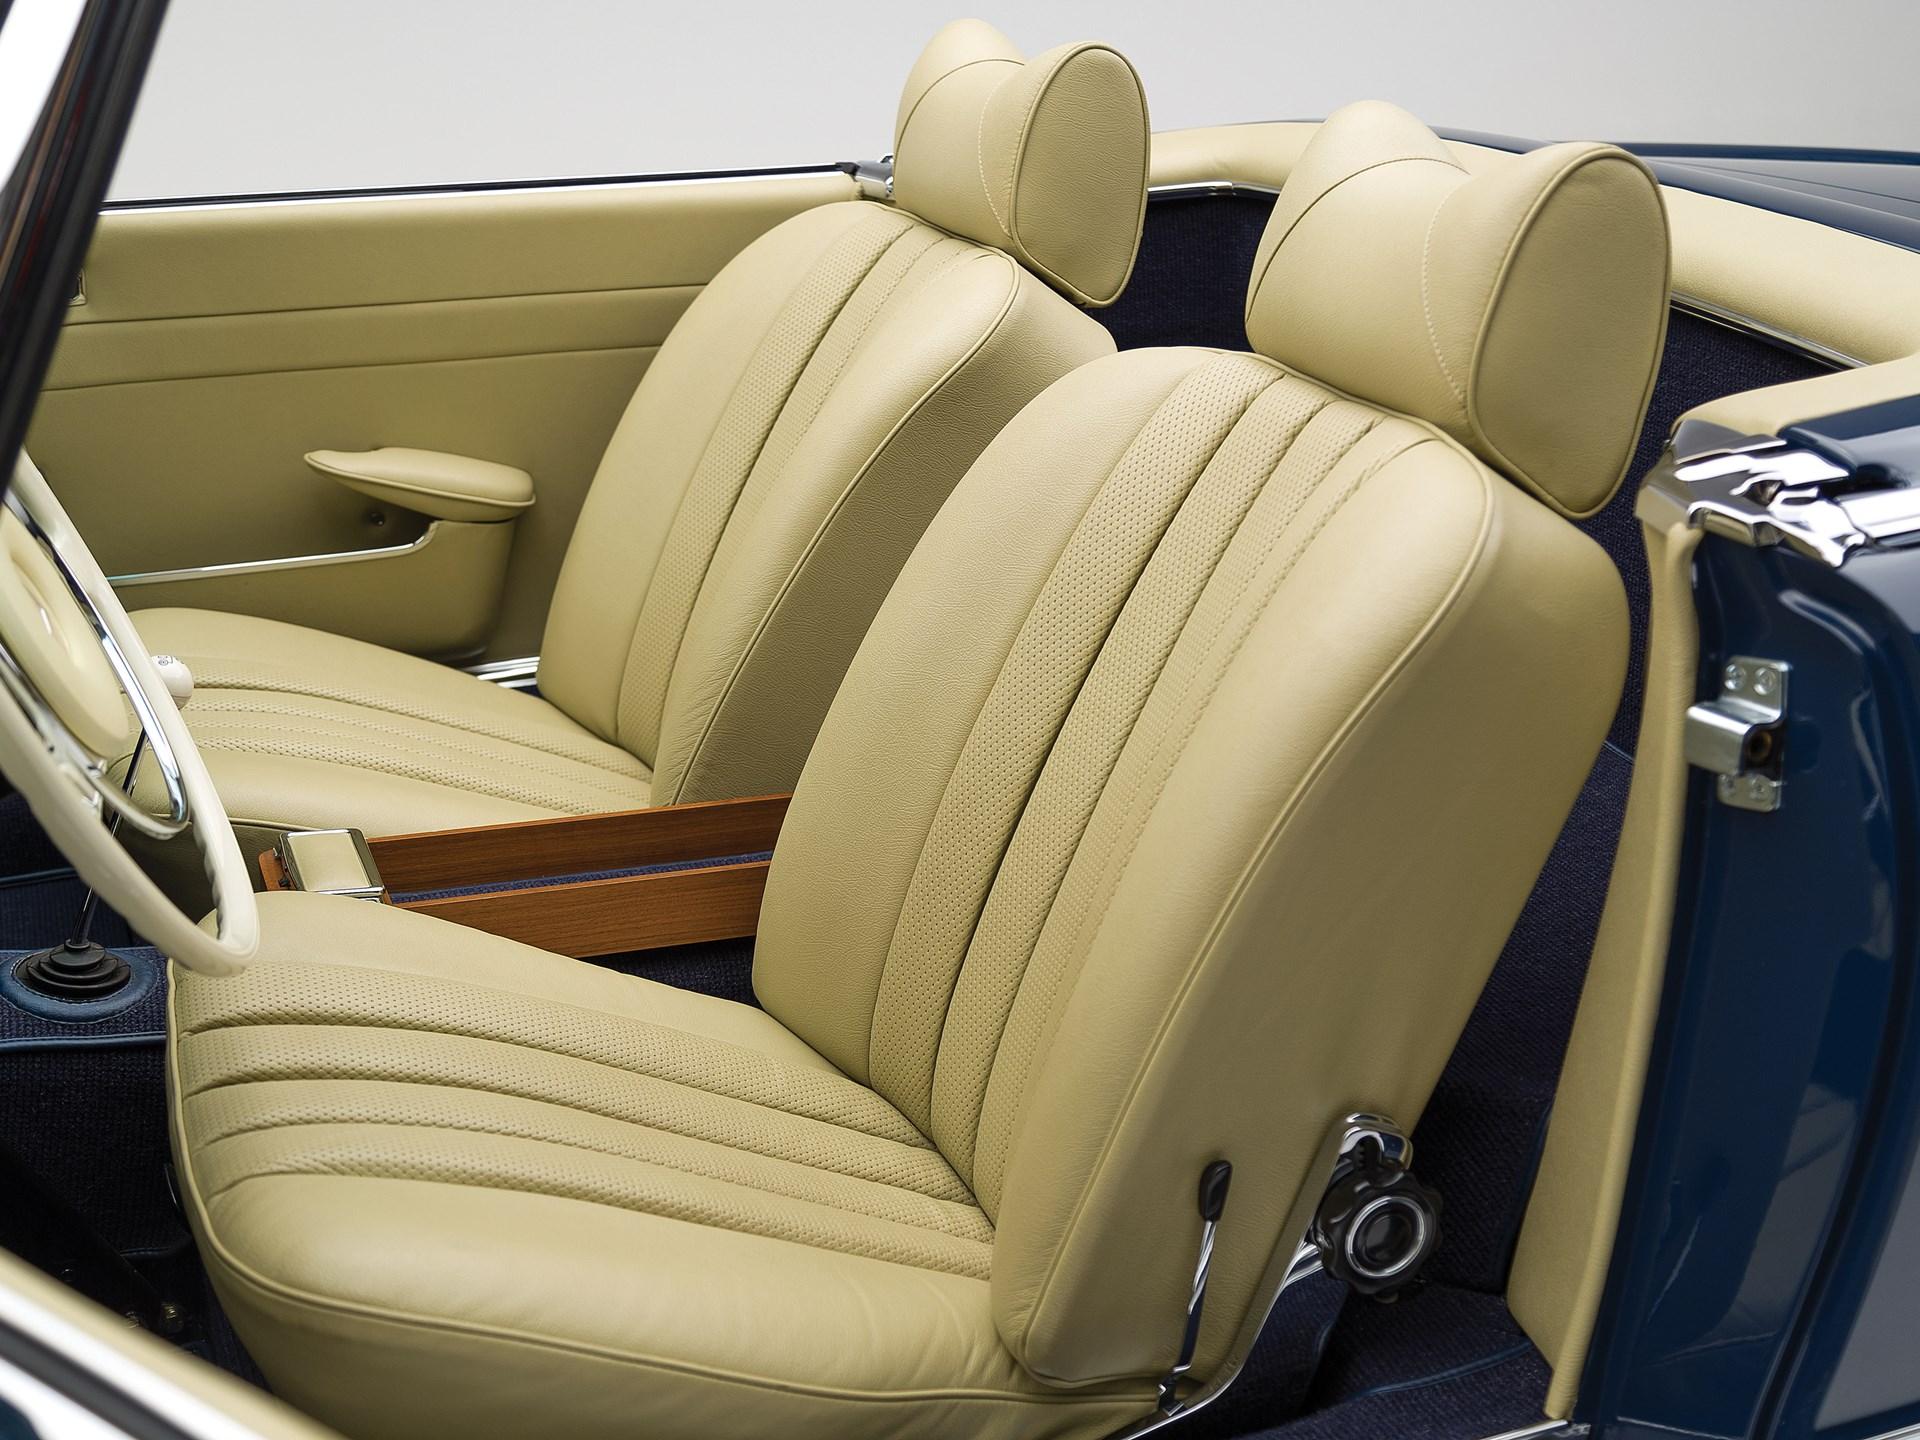 RM Sotheby's - 1968 Mercedes-Benz 280 SL 'Pagoda' | Amelia